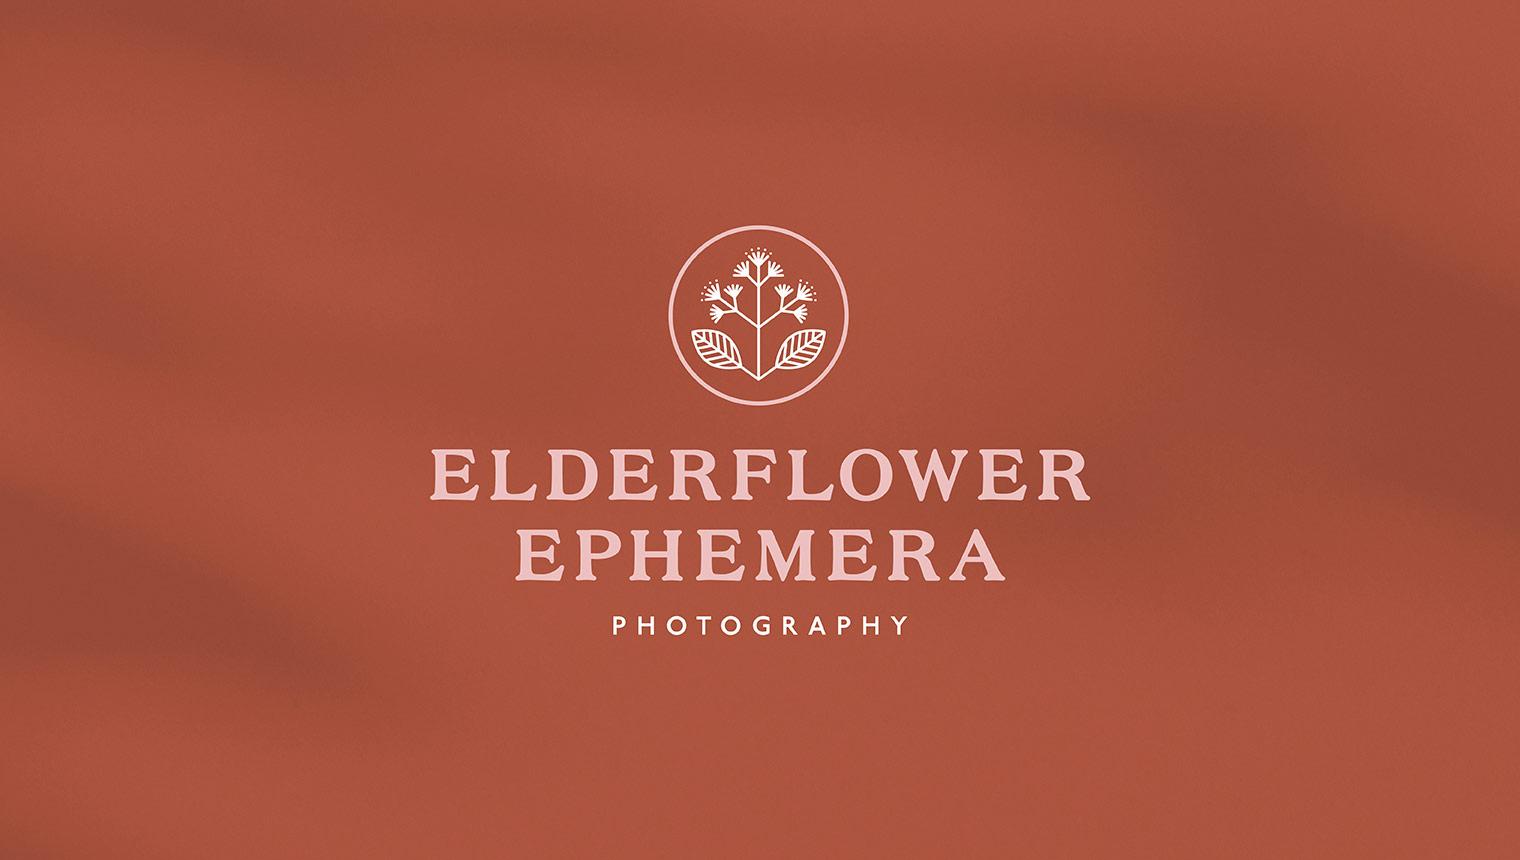 Vintage inspired logotype featuring floral emblem for film photographer elderflower ephemera